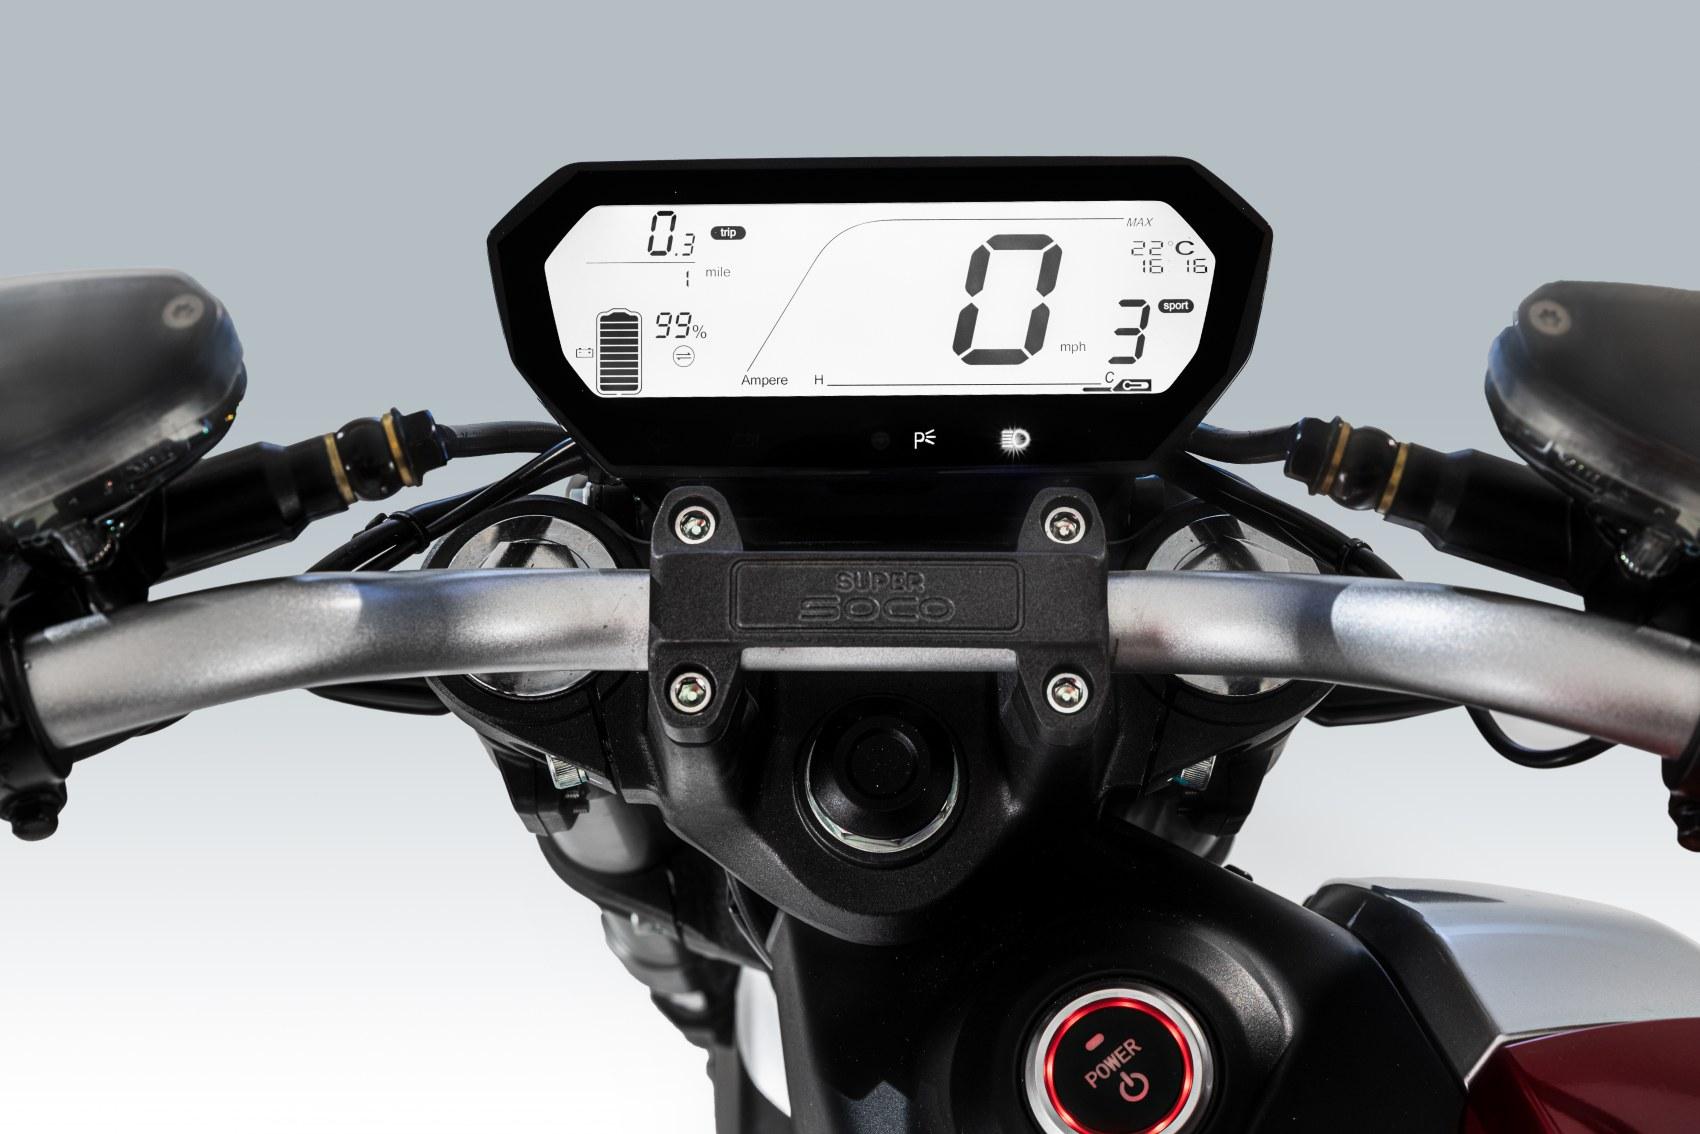 Super Soco TSx electric motorcycle digital dash display